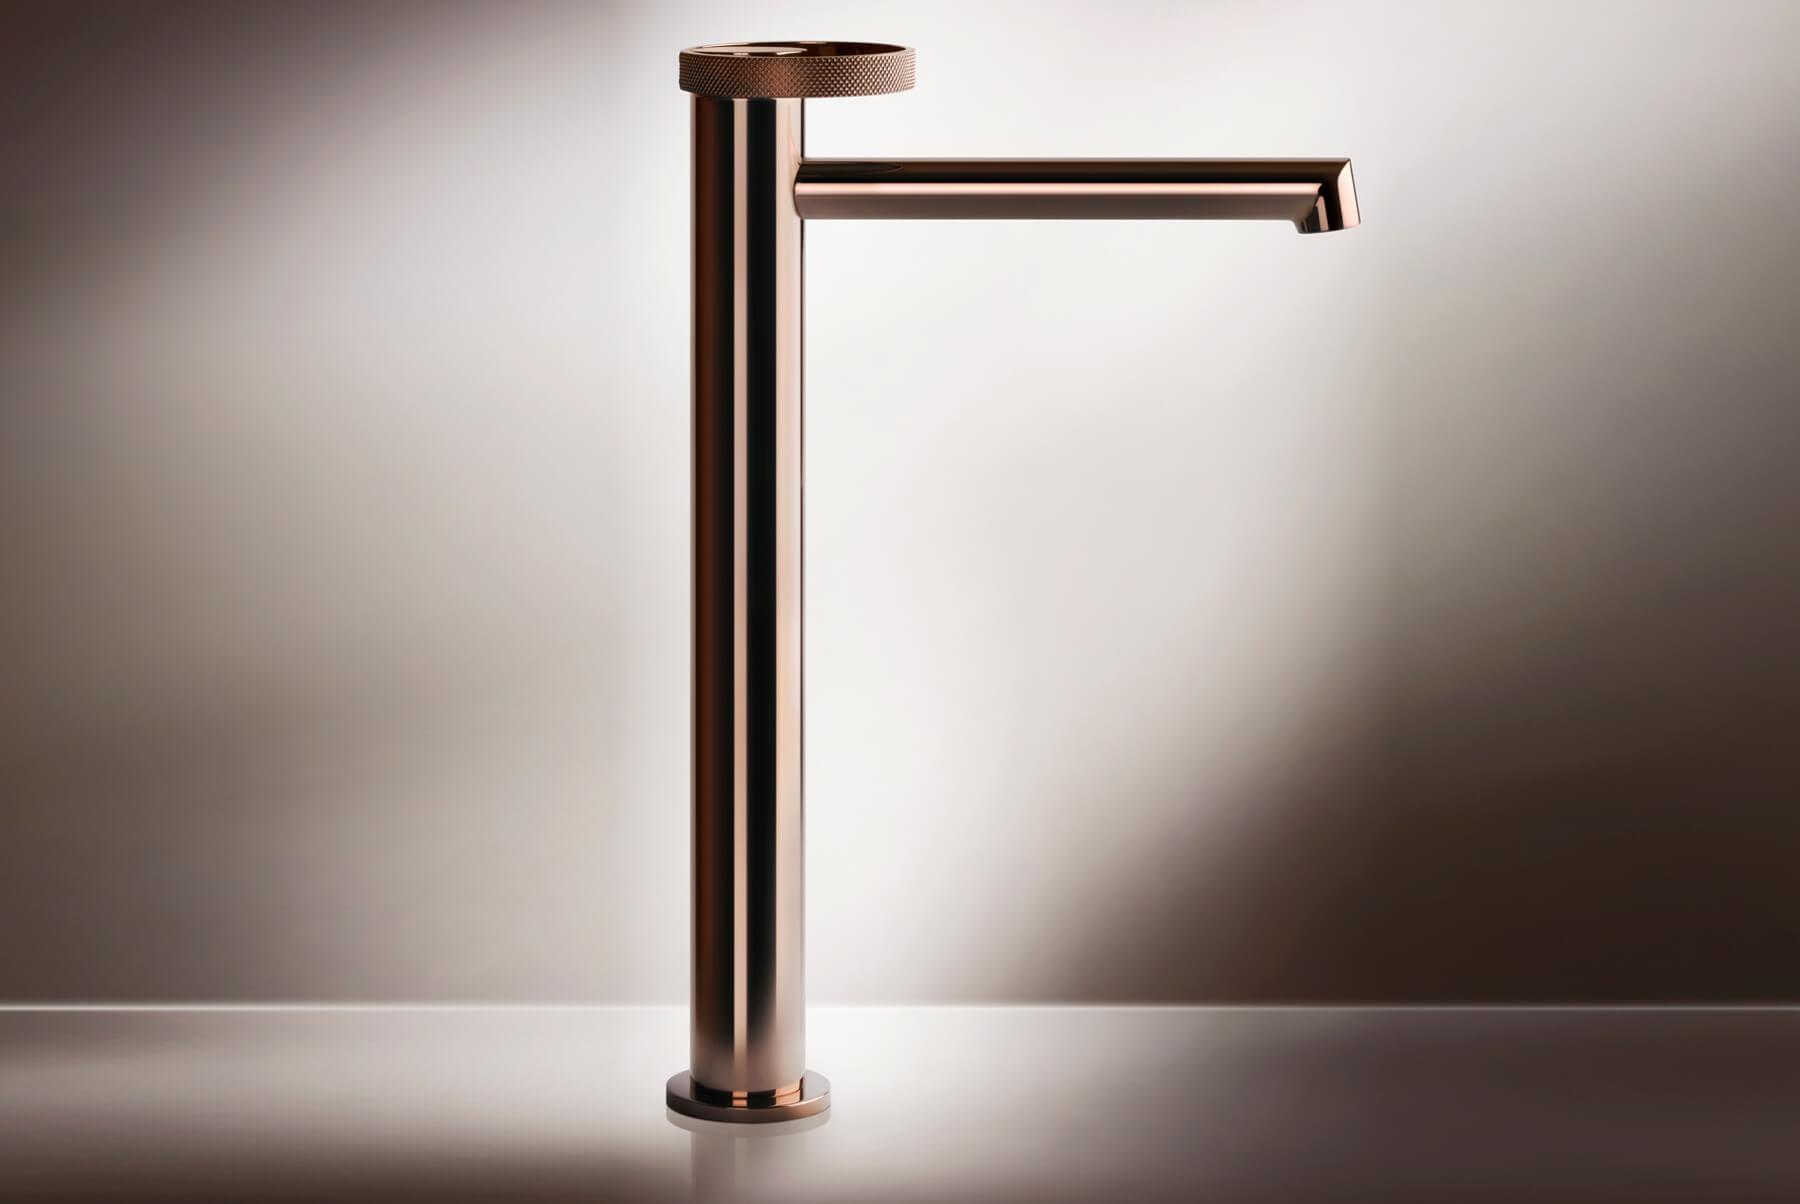 Brassware-GESSI-Anello-Inset-8-1800x1204